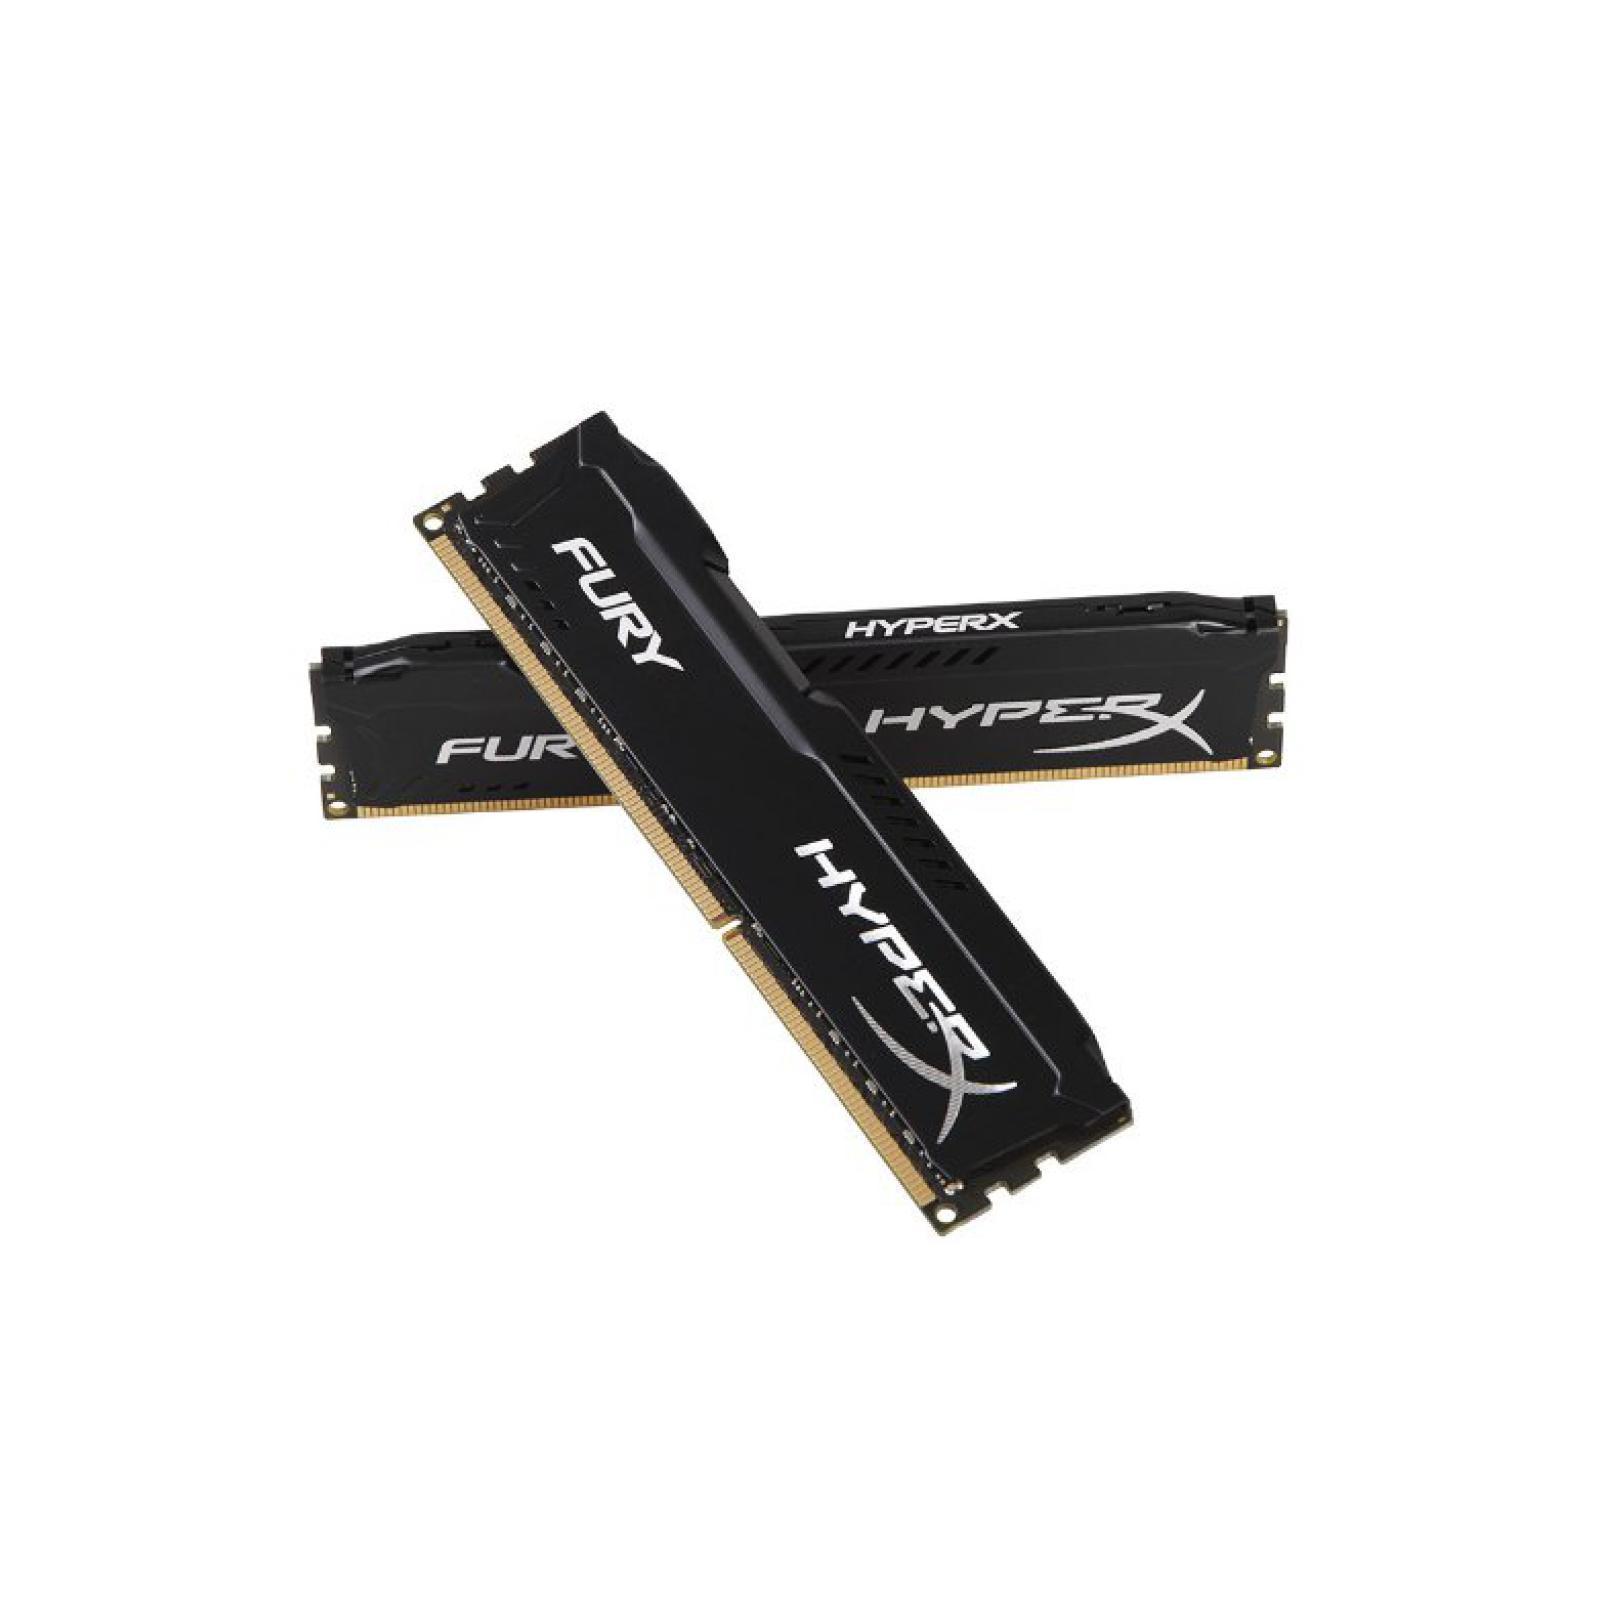 Модуль памяти для компьютера DDR4 32GB (2x16GB) 2933 MHz HyperX FURY Black HyperX (Kingston Fury) (HX429C17FBK2/32) изображение 3